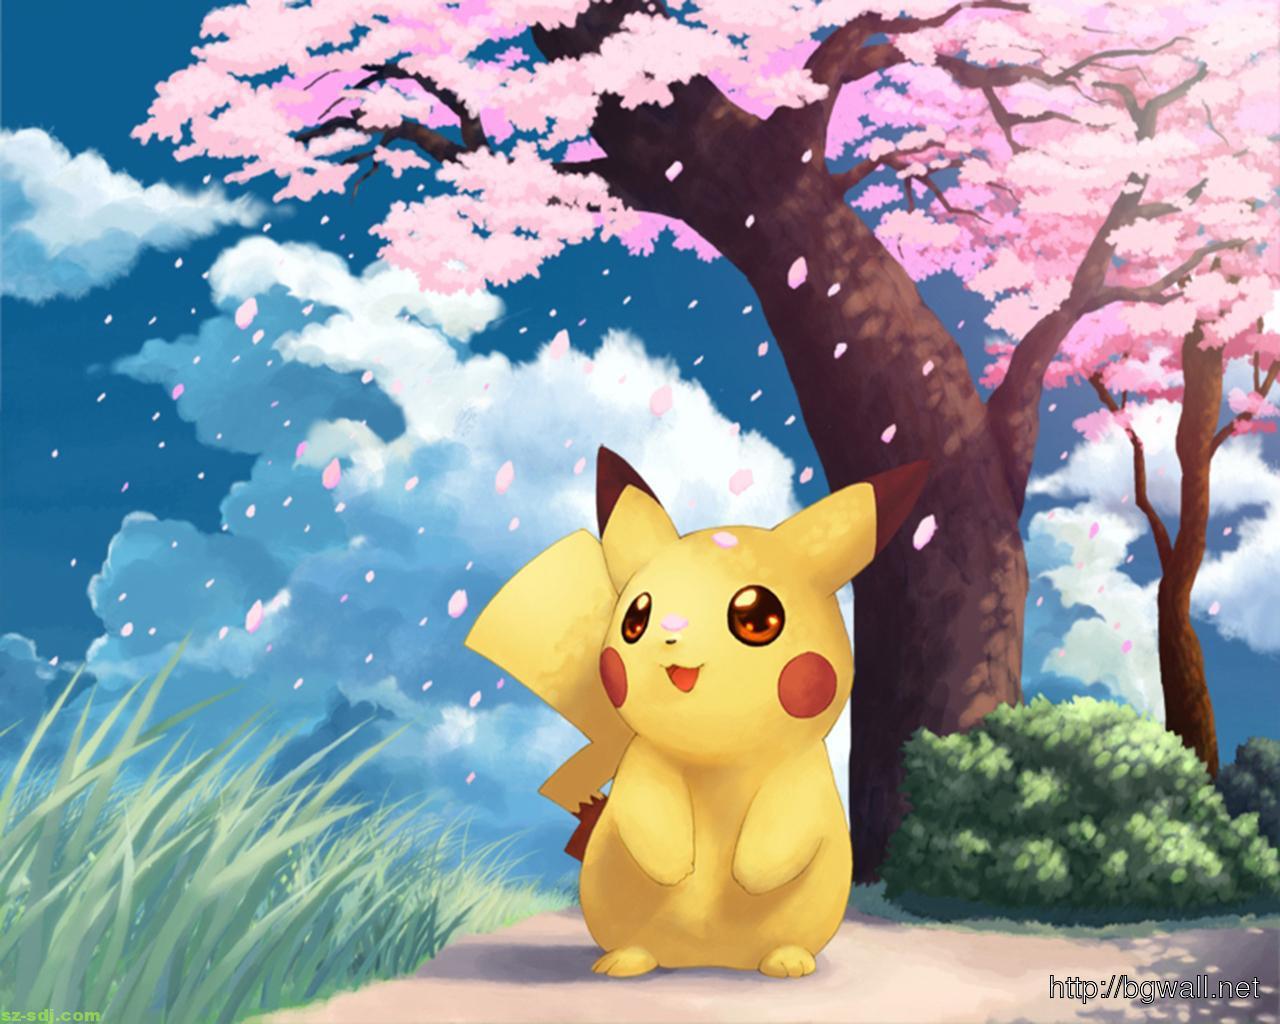 Cute Pikachu Pokemon W...